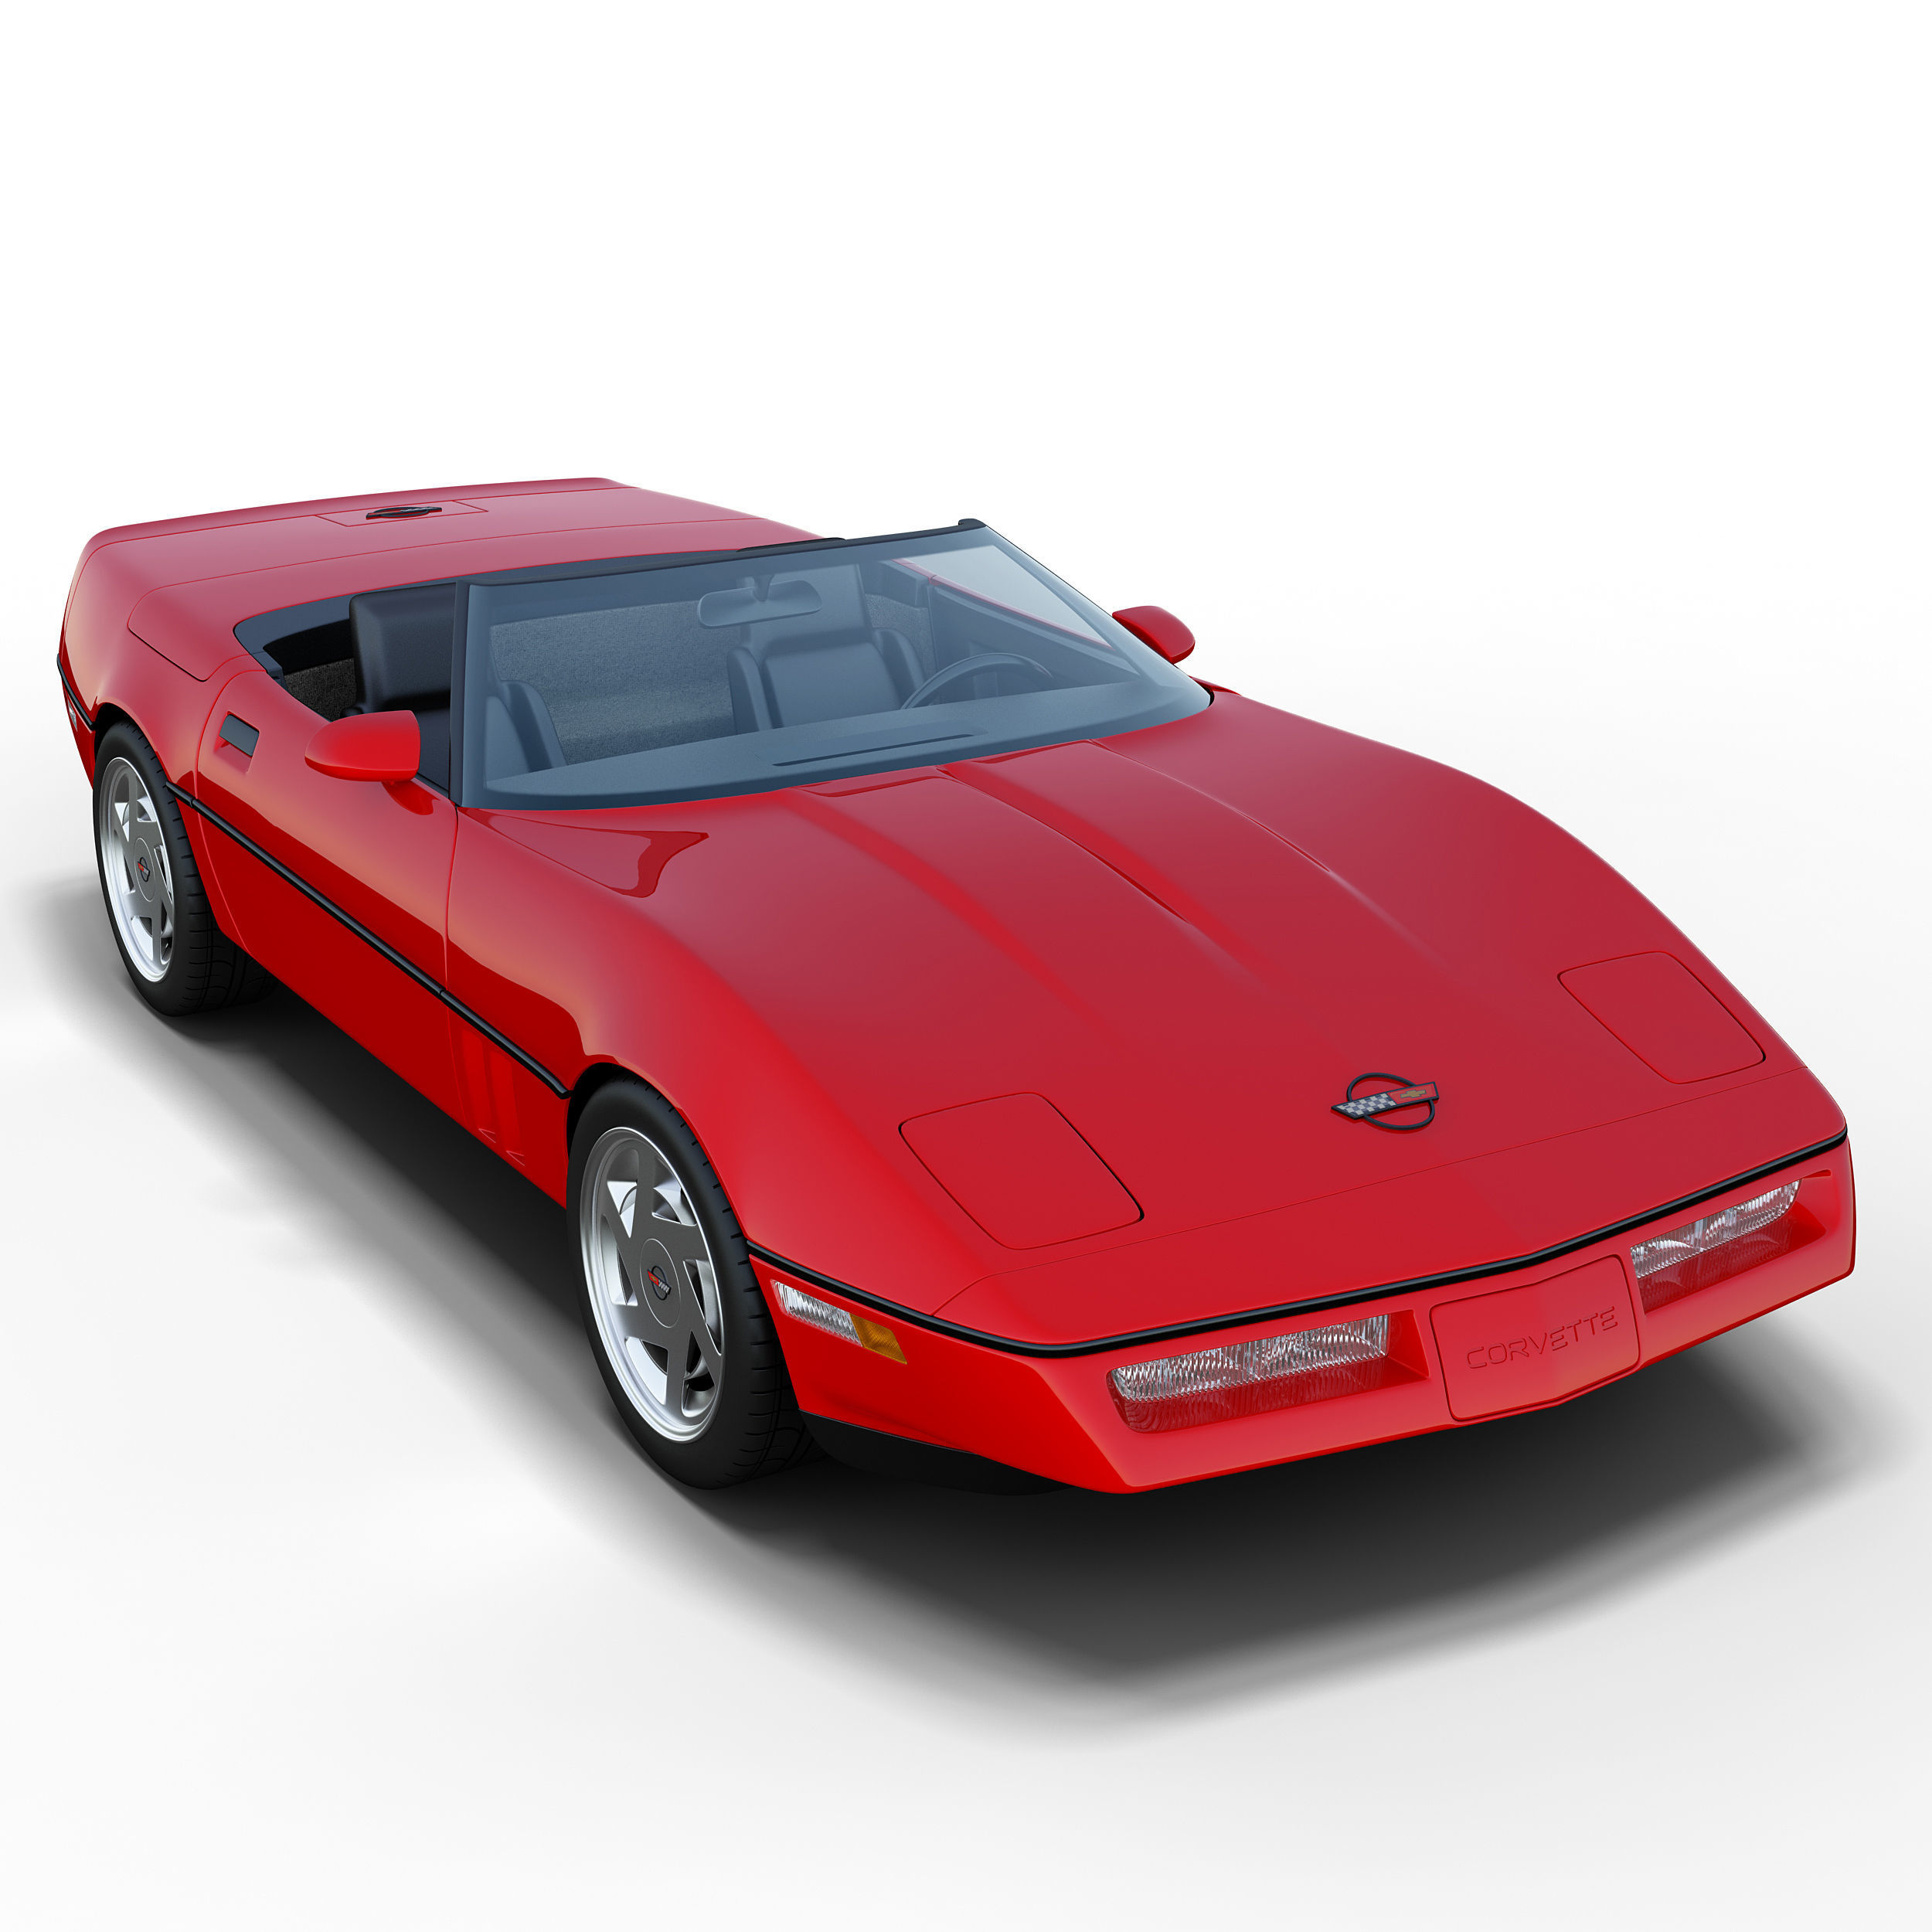 Chevrolet Corvette C4 Convertible Model